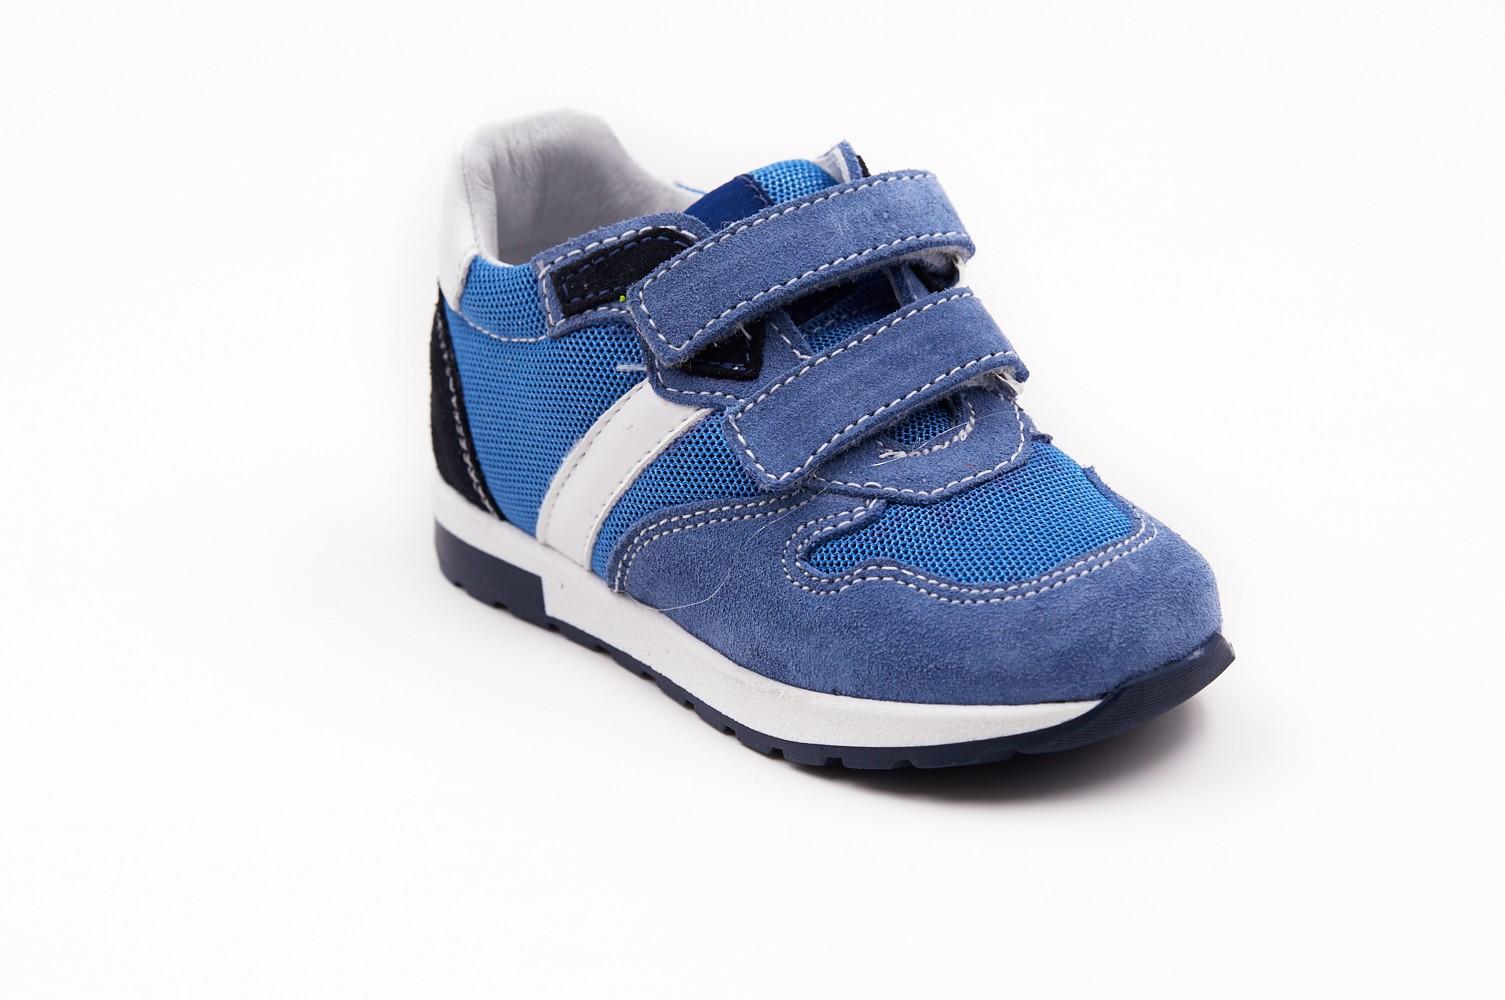 Pantofi sport albastri dublu scay